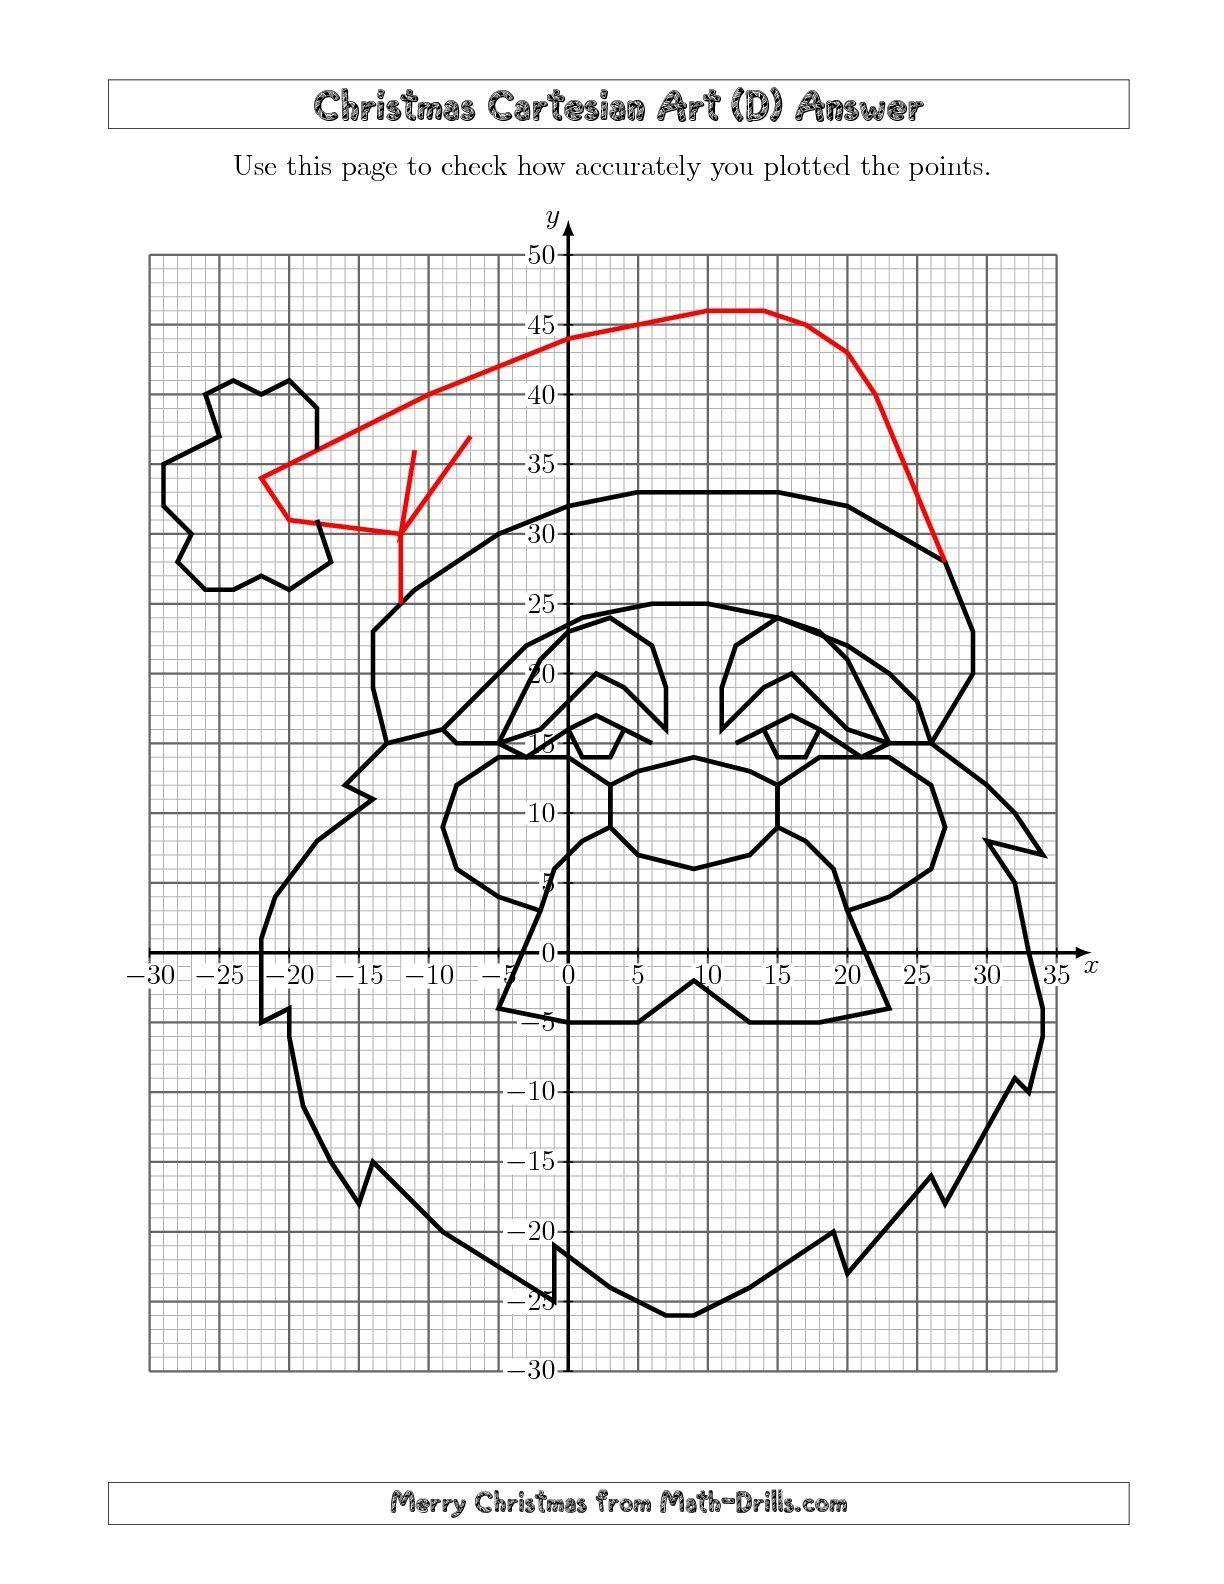 The Christmas Cartesian Art Santa (D) math worksheet from the Christmas  Math Worksheet page at Math-Dr…   Coordinate graphing [ 1584 x 1224 Pixel ]